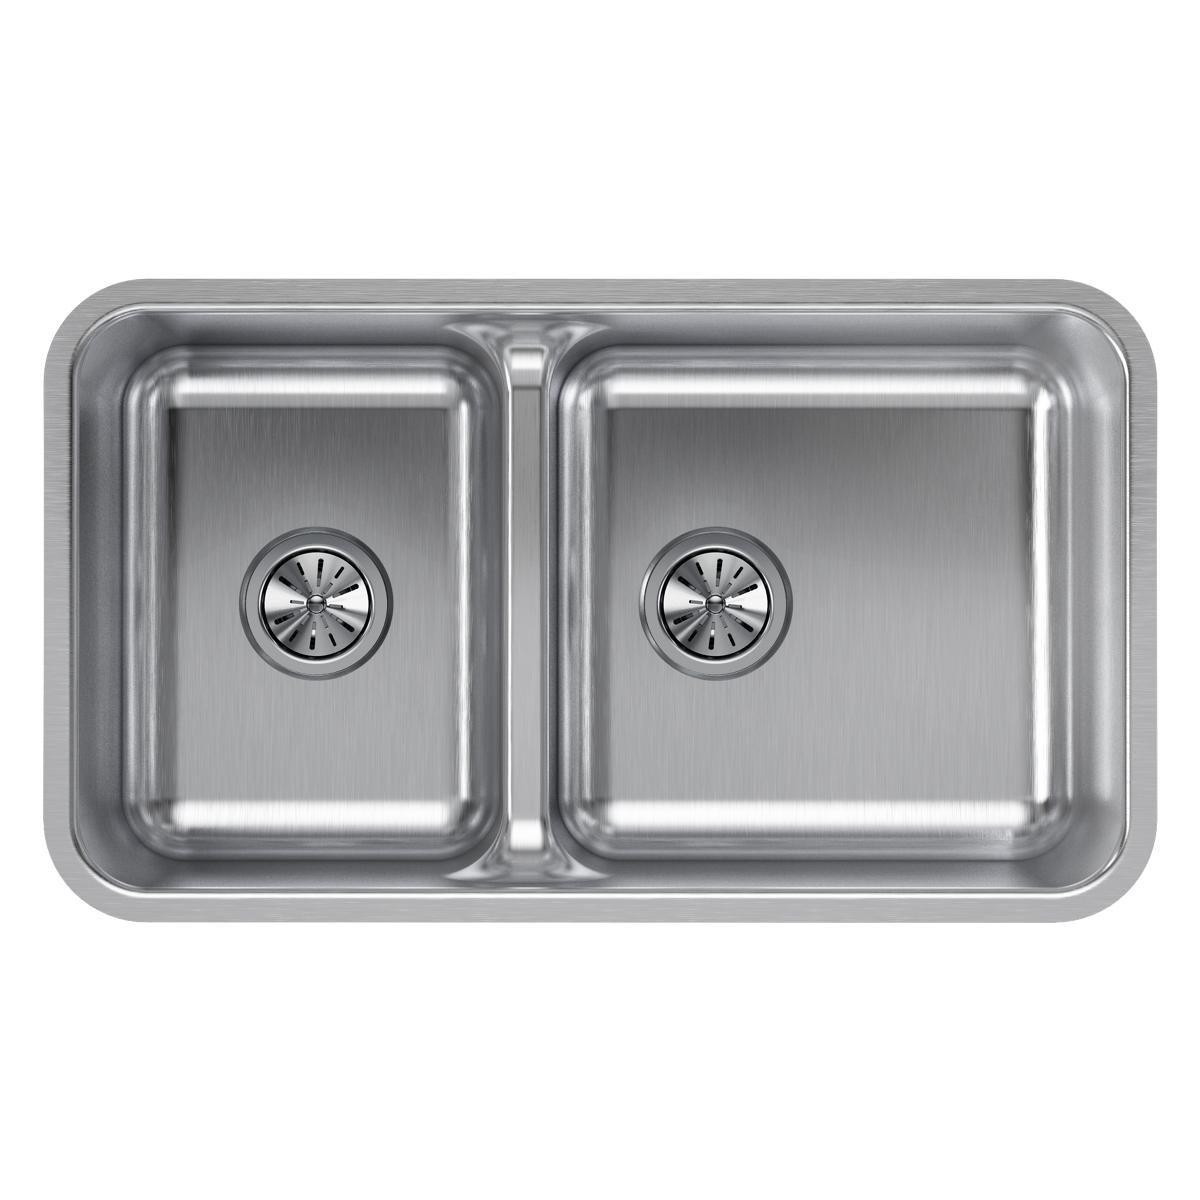 Elkay Lustertone ELUHAQD32179 40/60 Double Bowl Undermount Stainless Steel Sink with Aqua Divide